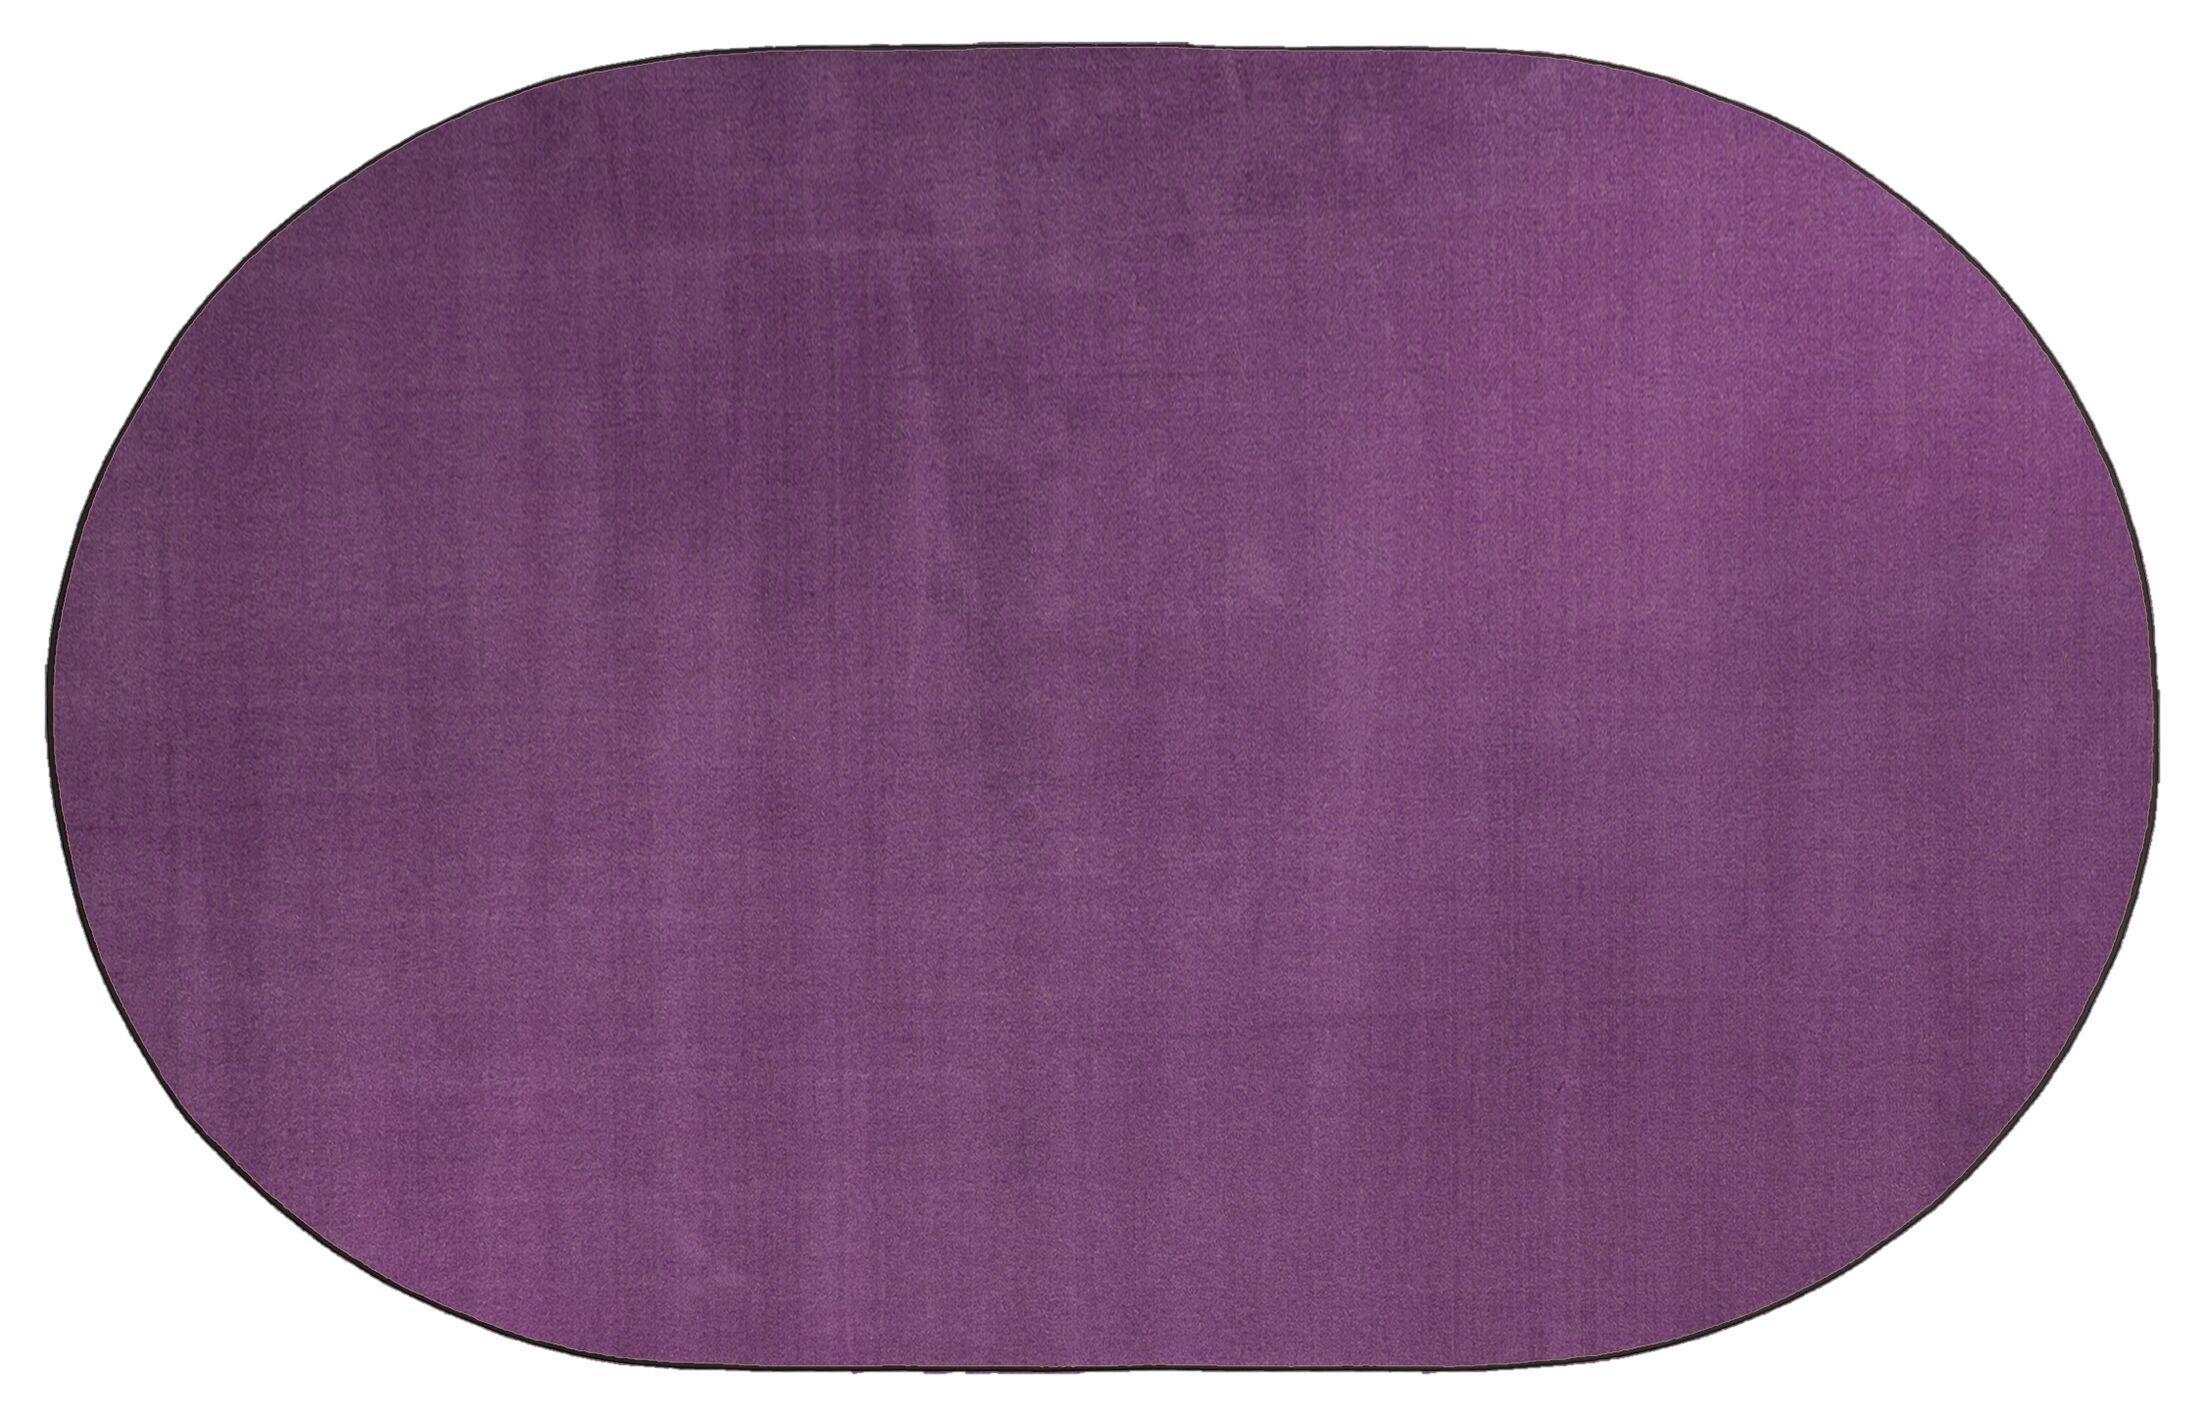 Americolors Pretty Purple Area Rug Rug Size: Oval 12' x 18'